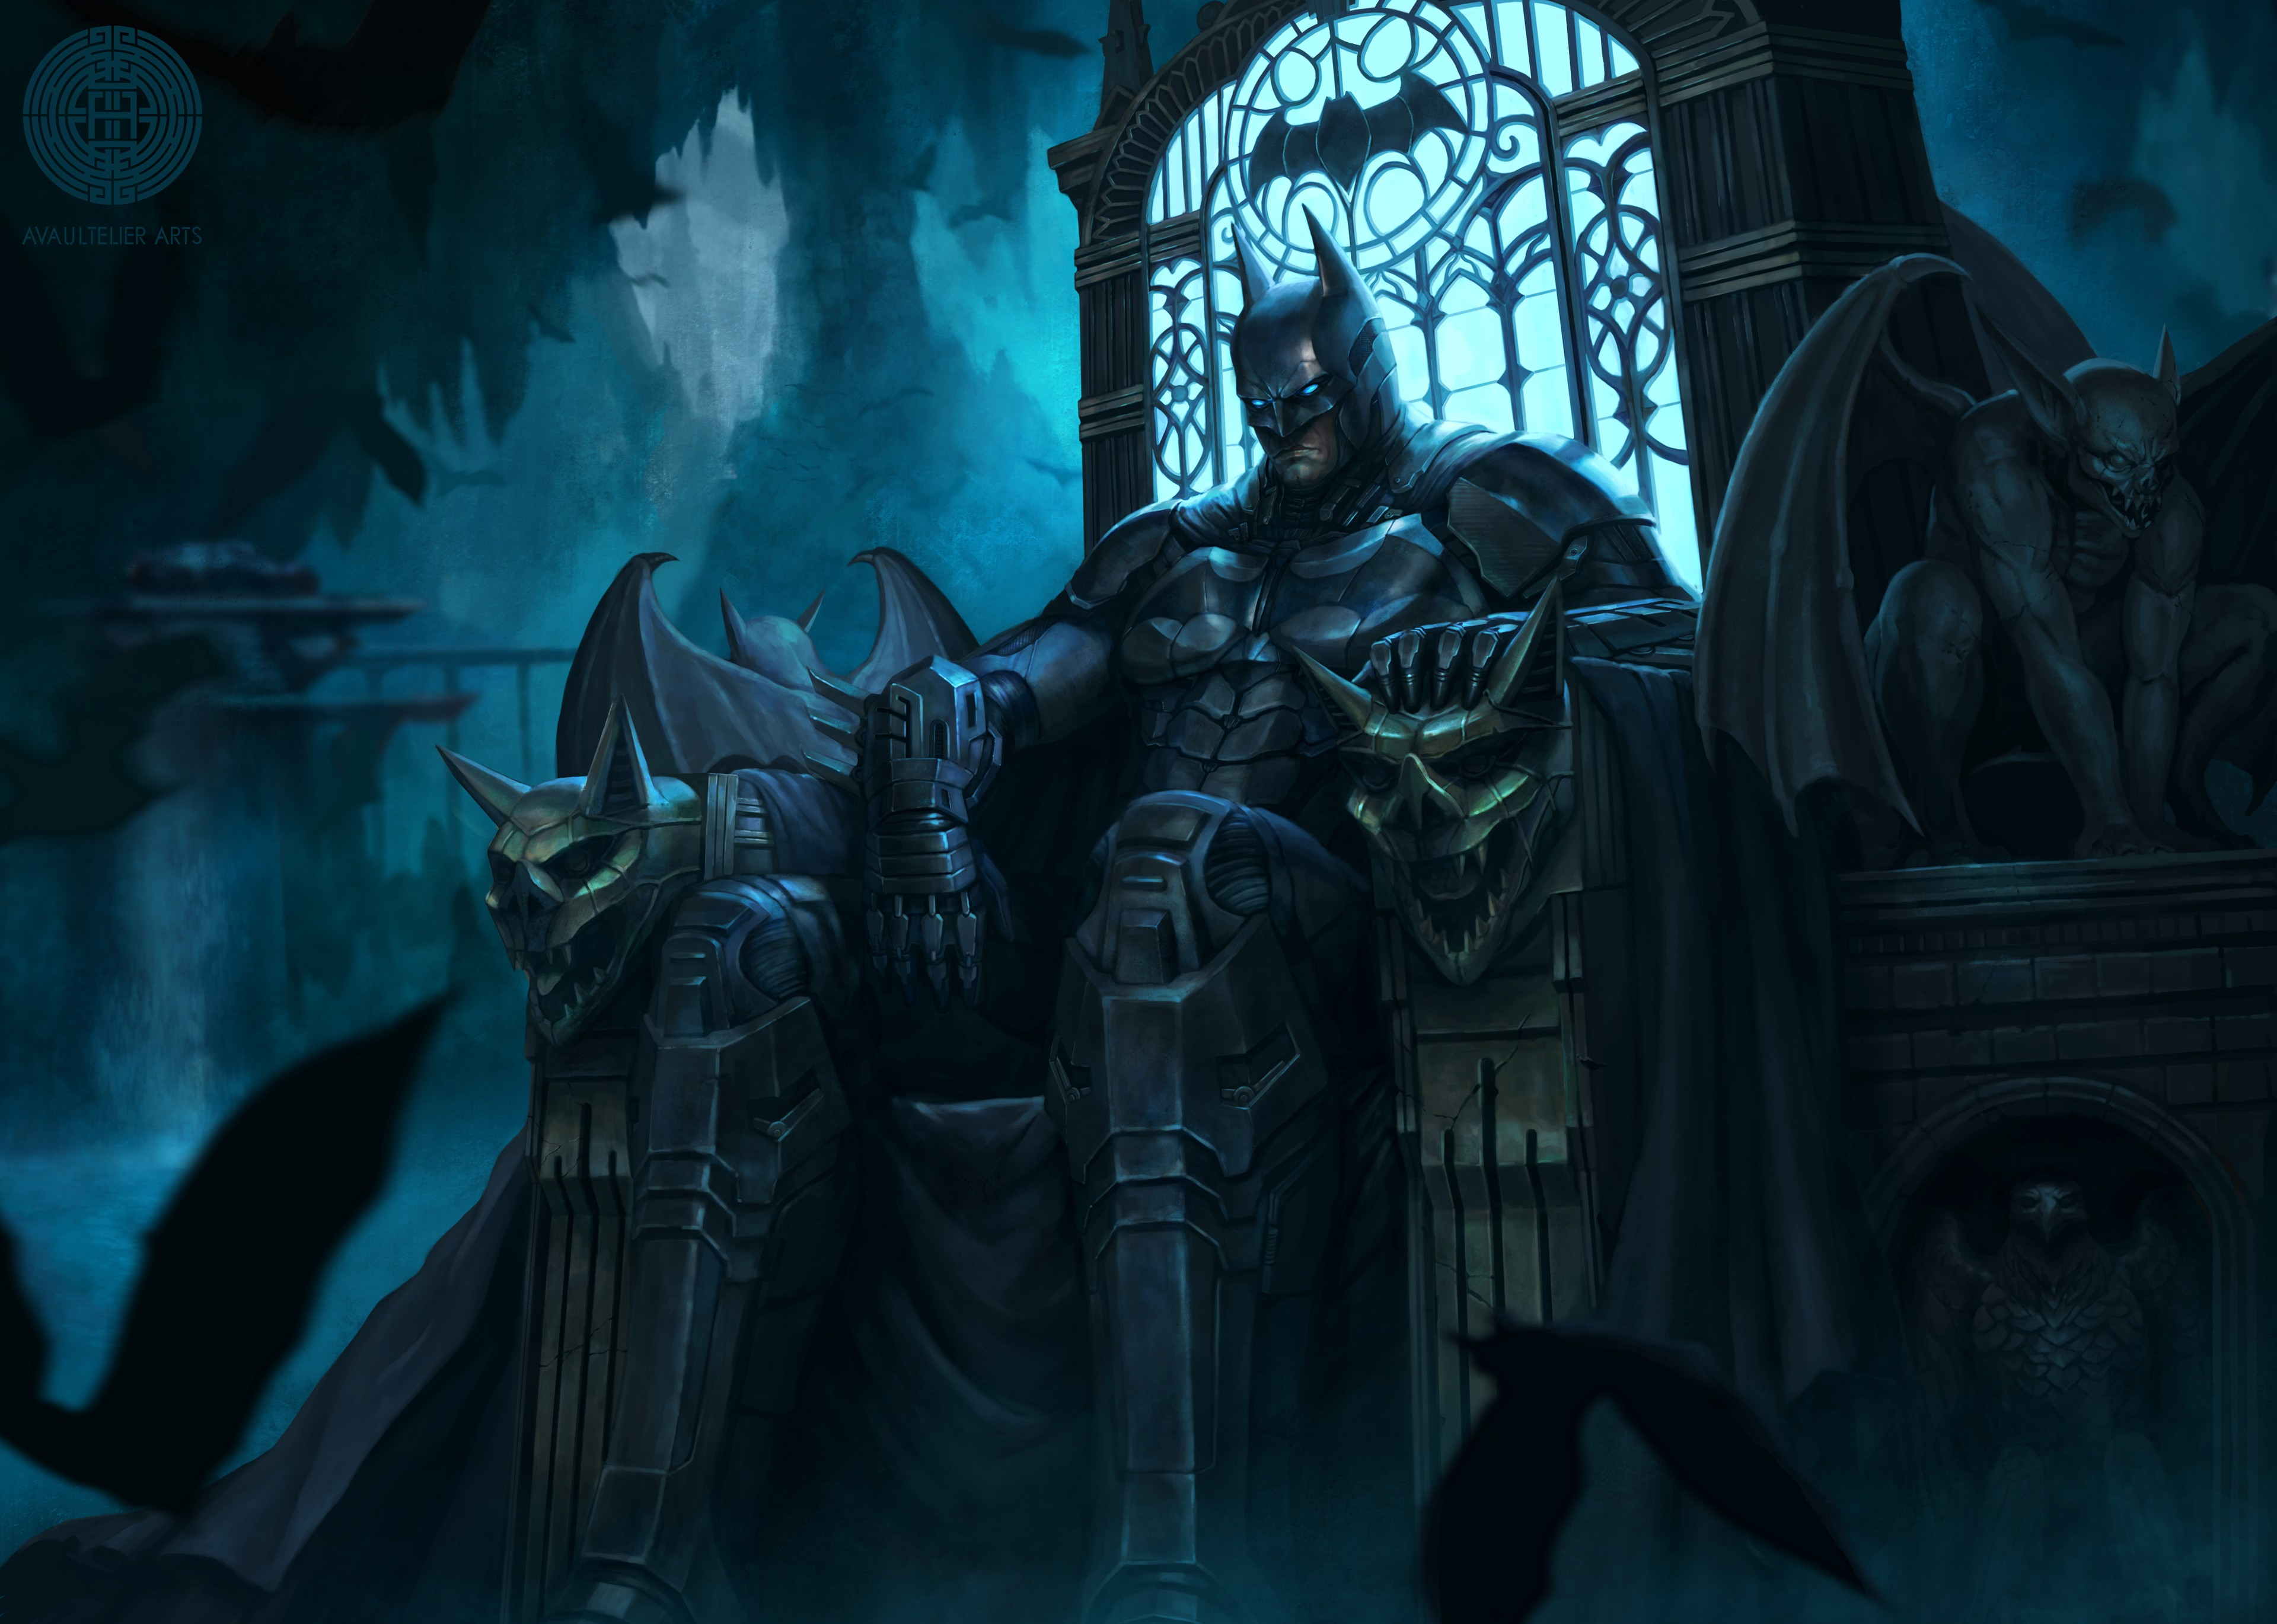 batman s throne 1581356486 - Batman's Throne - Batman's Throne wallpapers, Batman's Throne phone wallpapers 4k, Batman's Throne 4k wallpapers